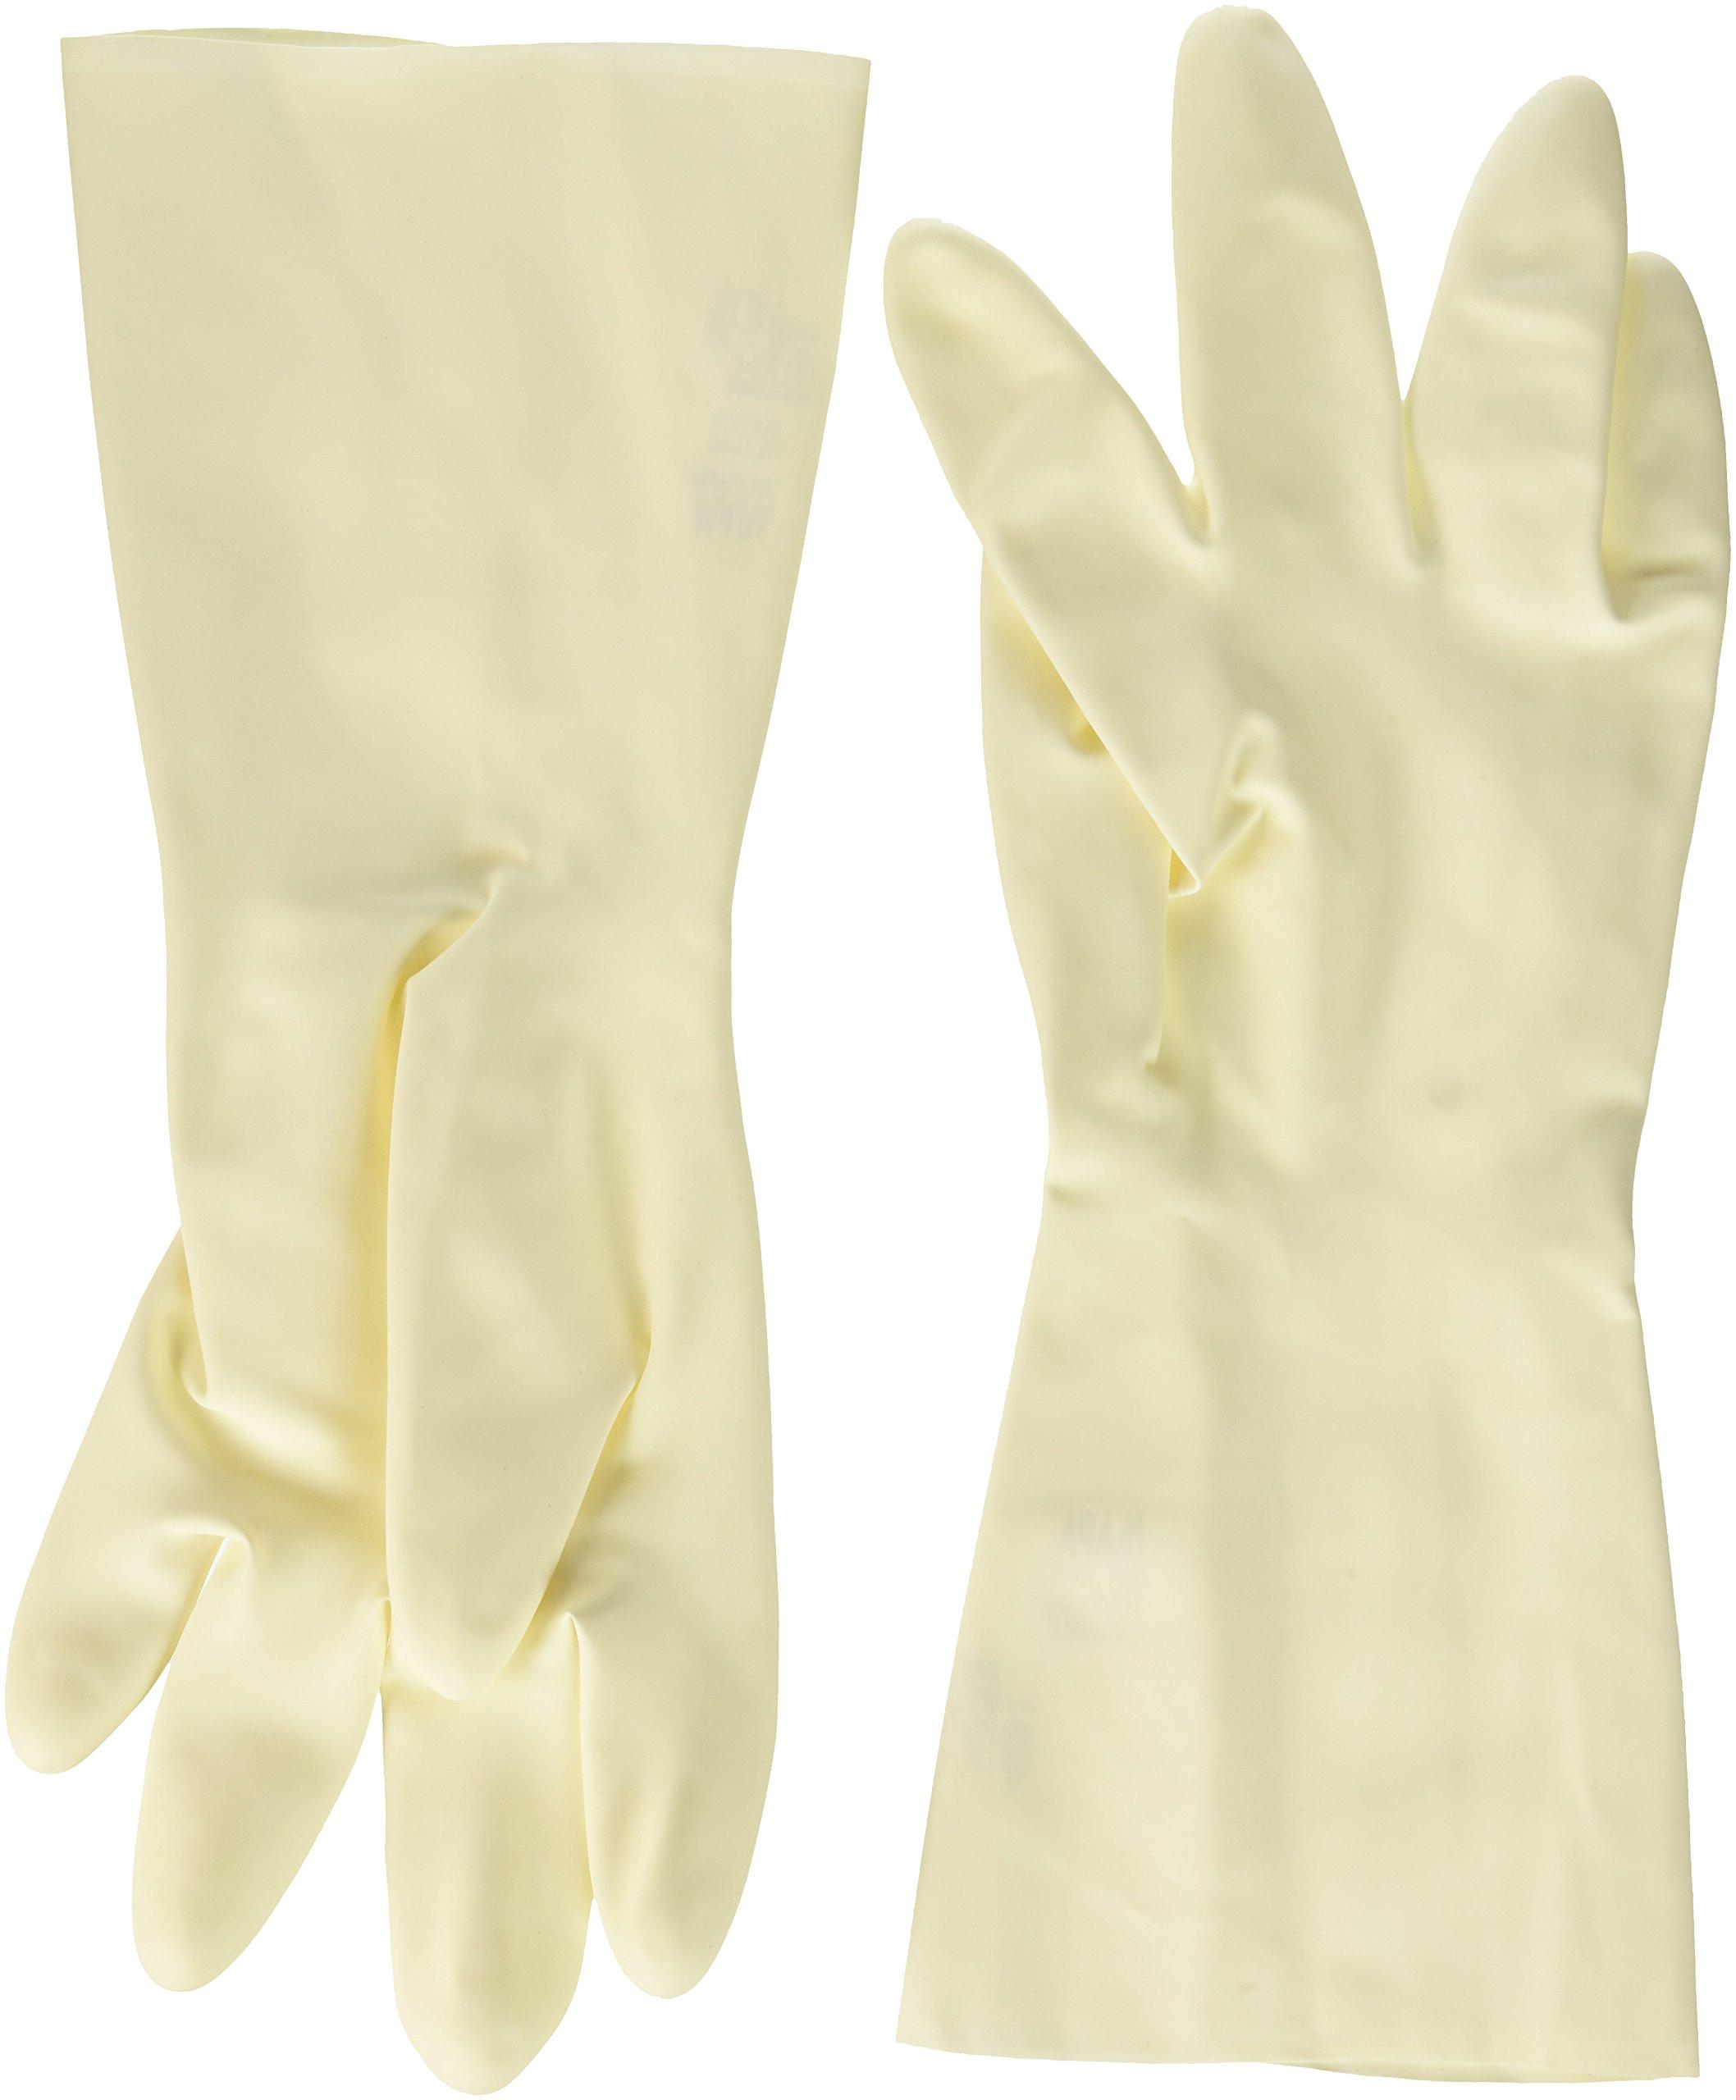 Matfer Bourgeat 262290 Sugar Work Gloves, Medium